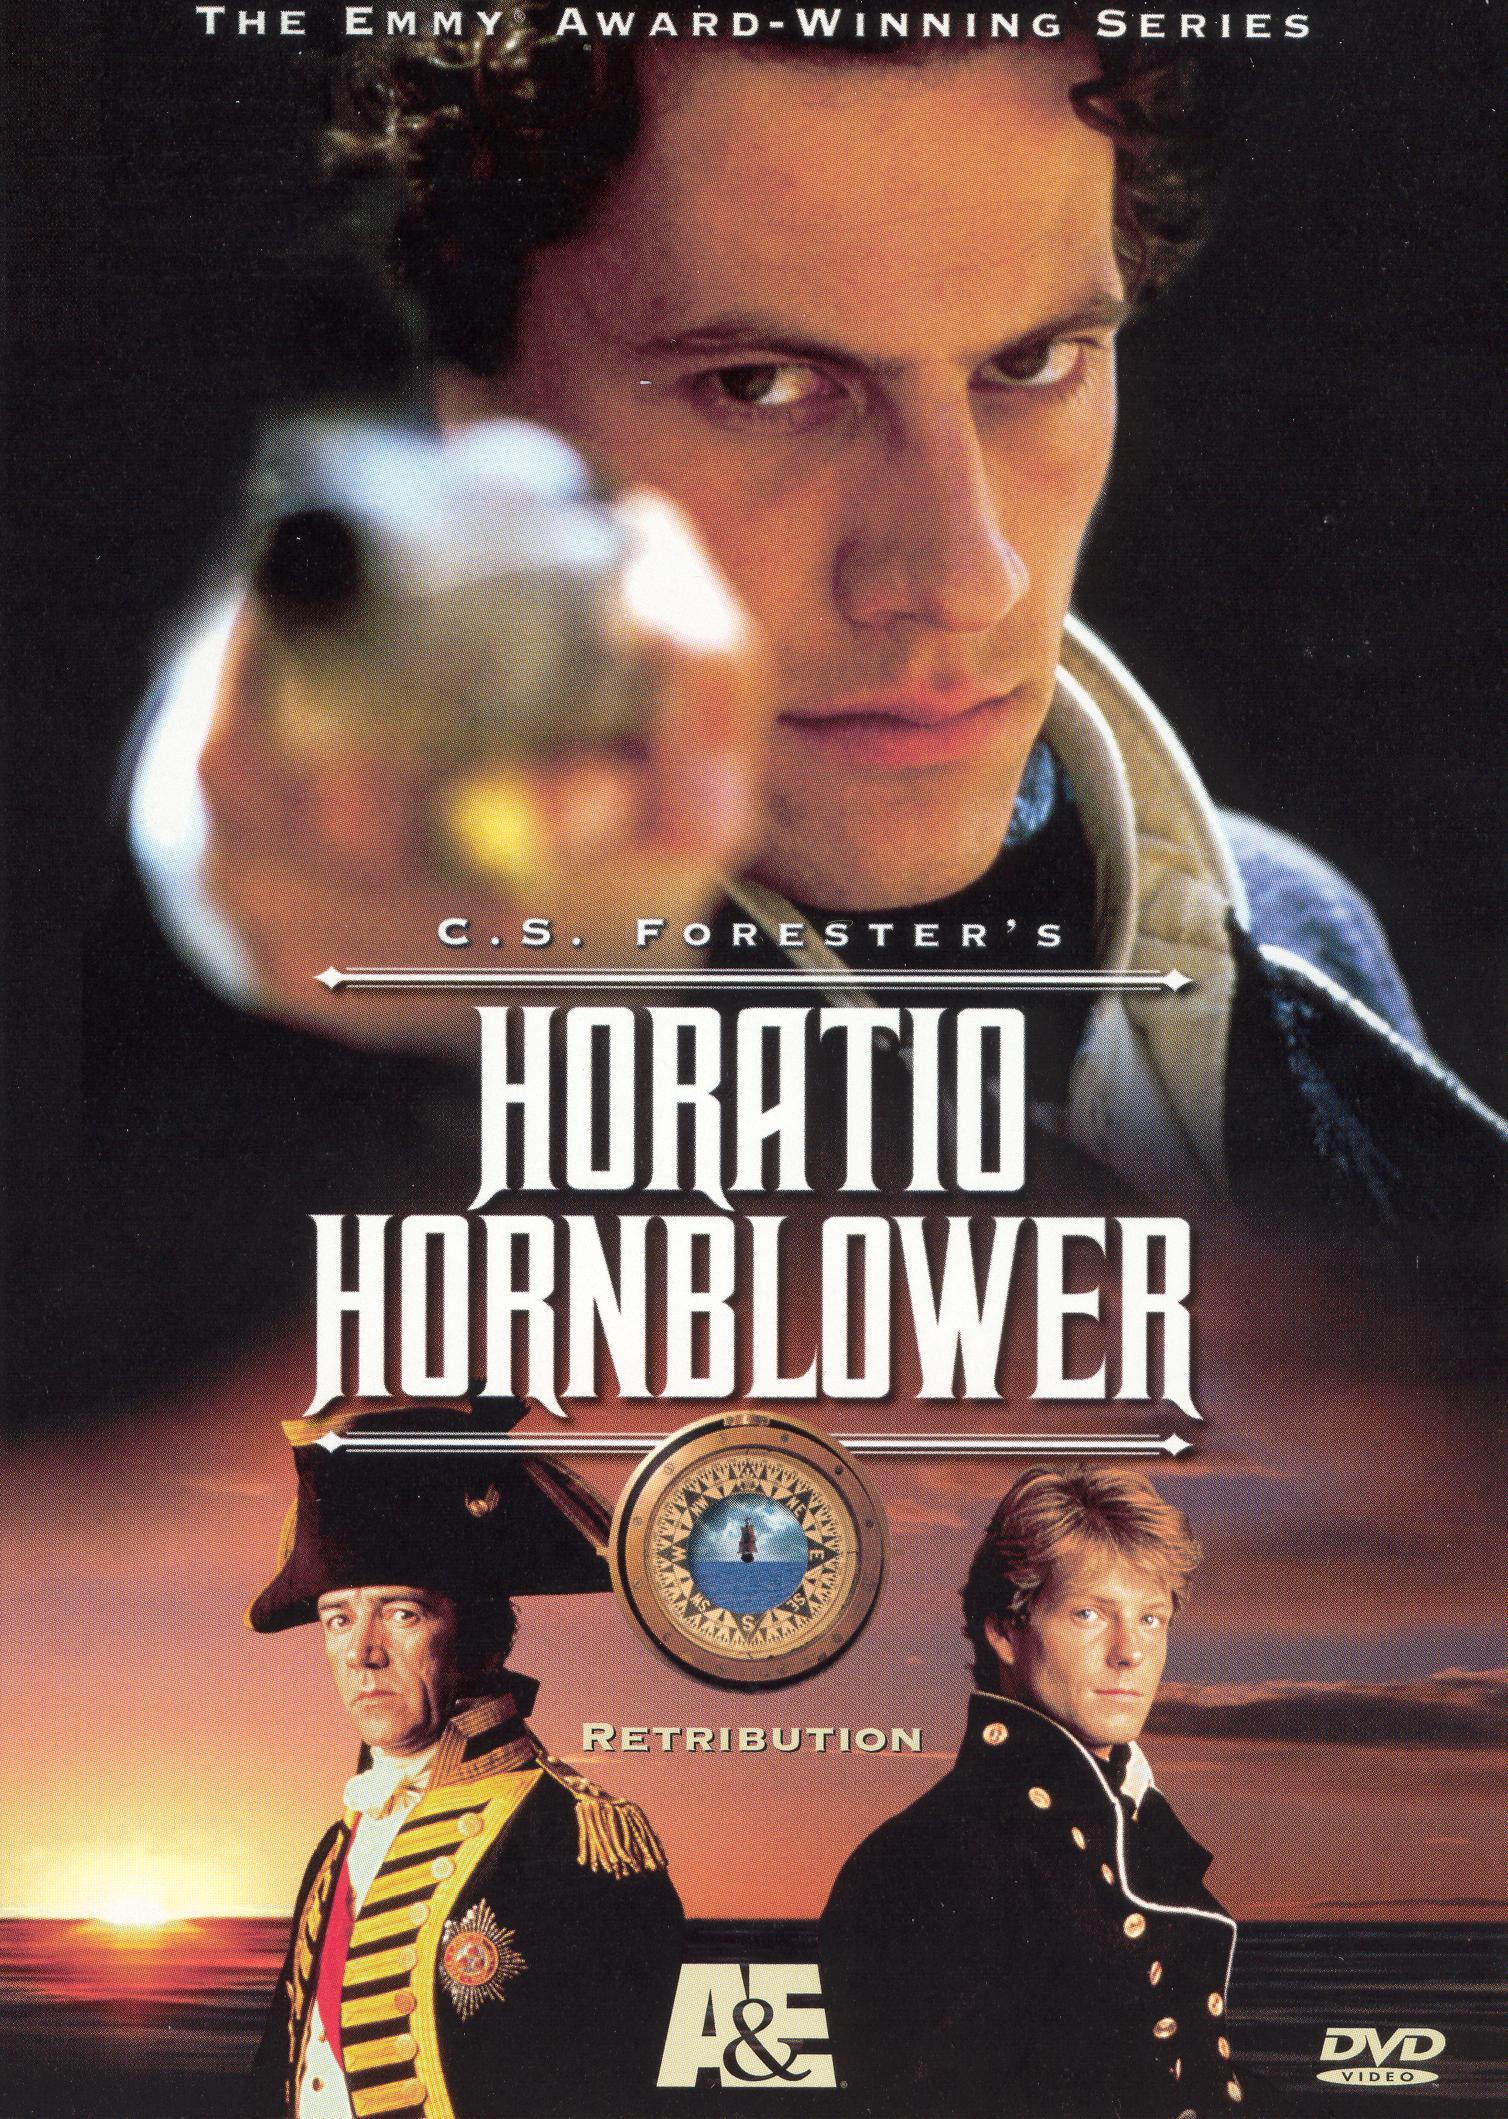 Horatio Hornblower: The Adventure Continues - Retribution